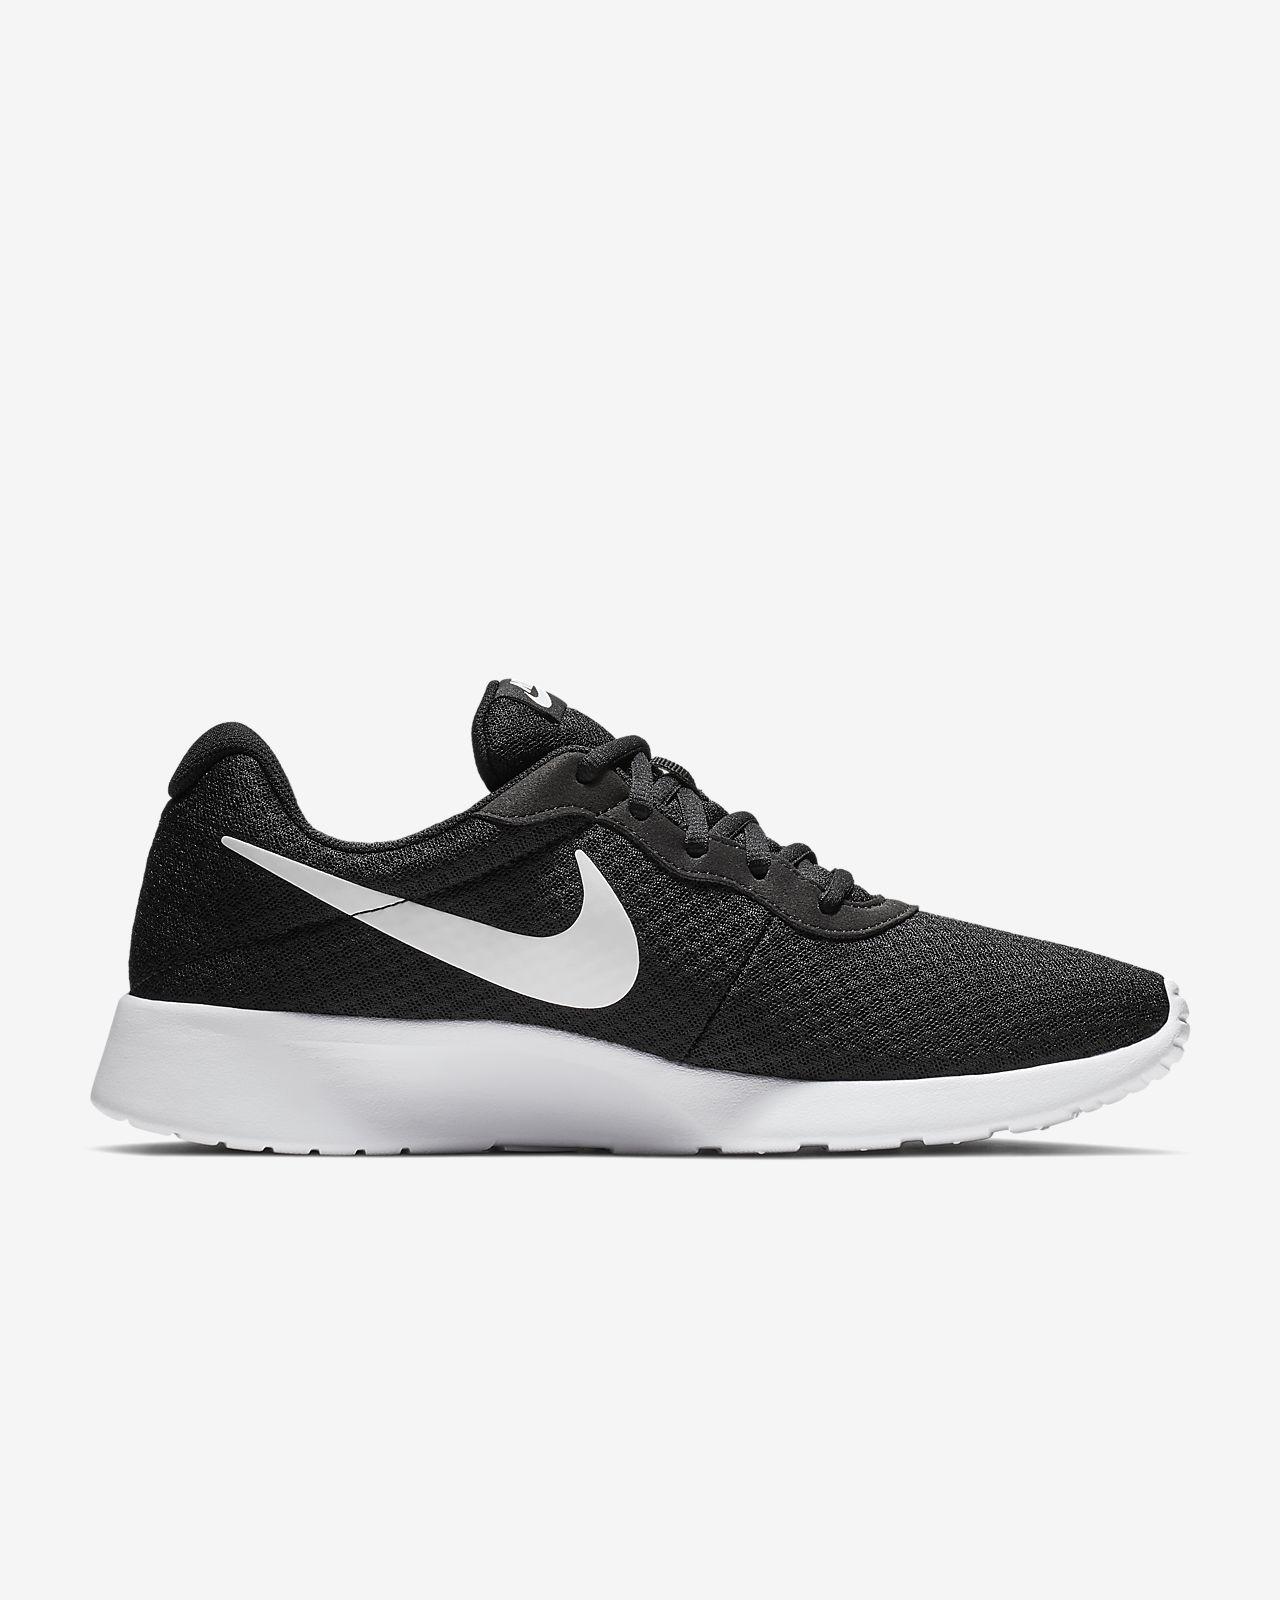 Details zu NIKE Damen Freizeitschuhe Sneaker Trainingsschuhe WMNS Nike Tanjun Farbwahl